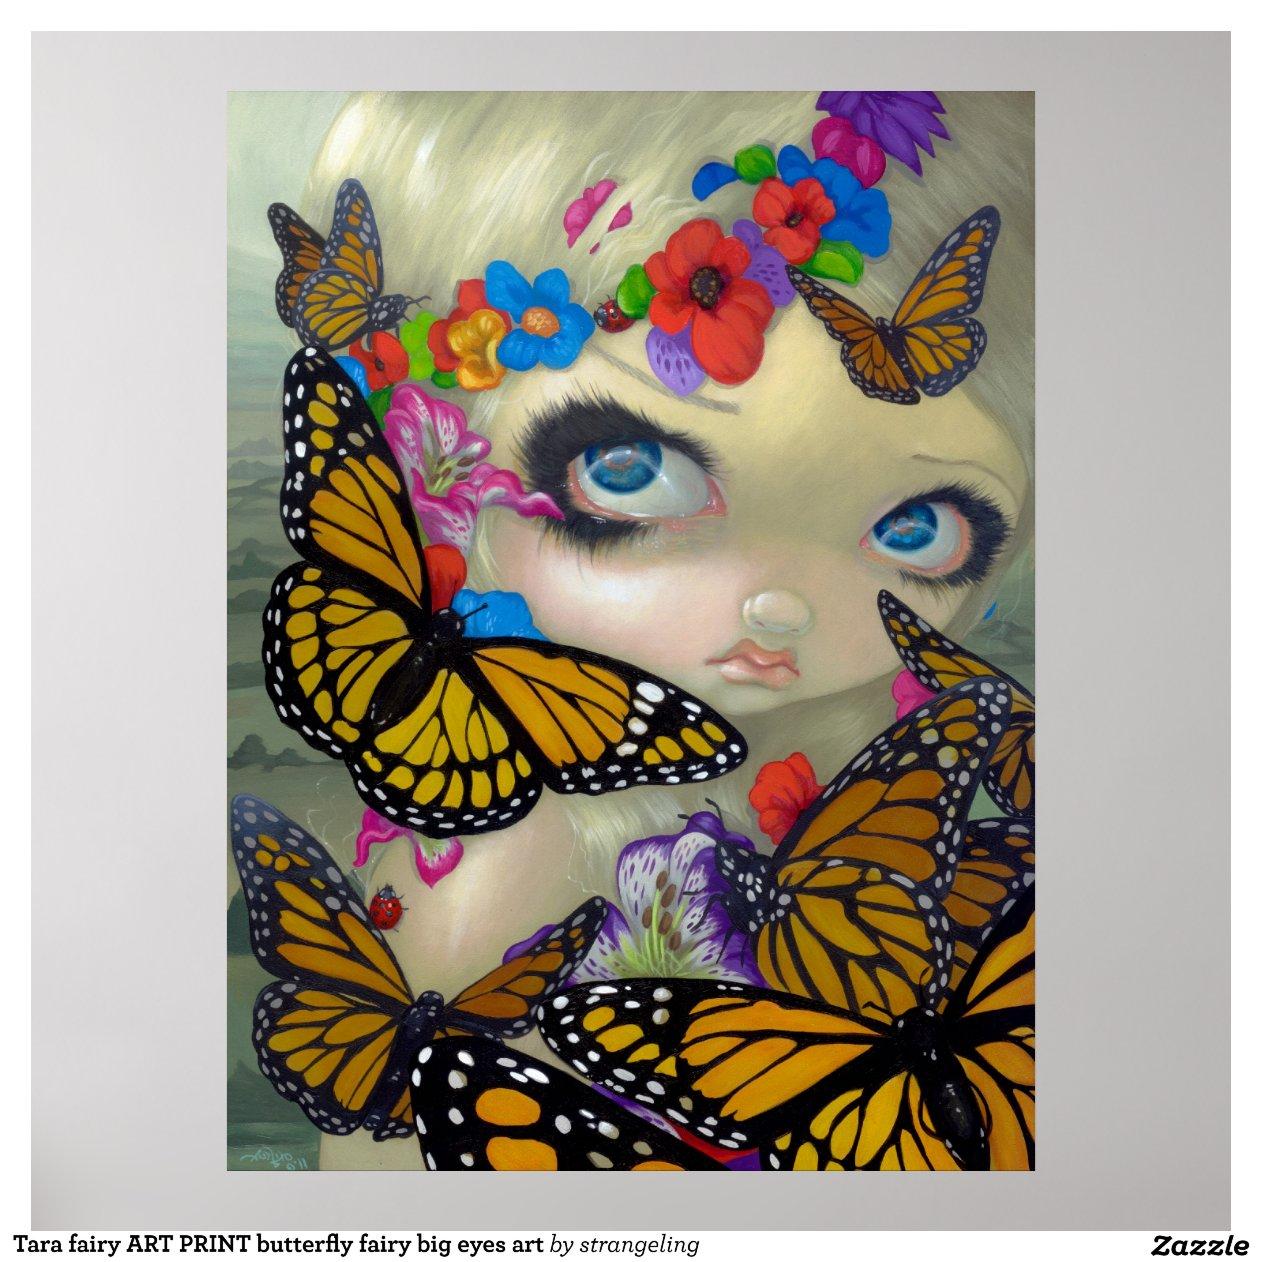 Tara Fairy Art Print Butterfly Big Eyes Art-r921491eb9f944174aa8509242ce05778 Ainqk 8byvr